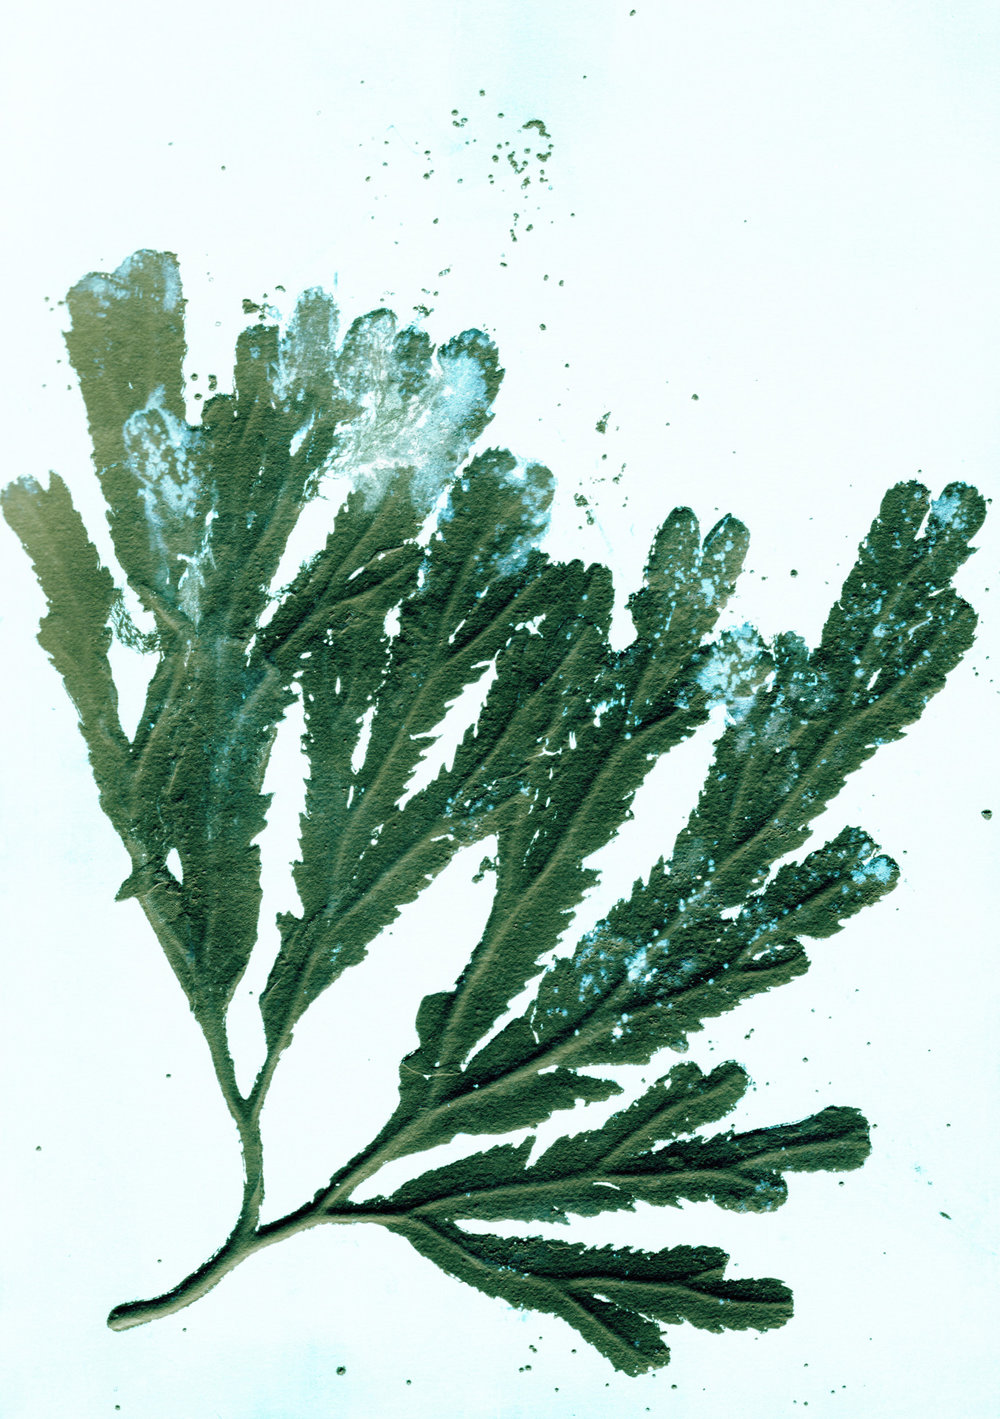 _A5.seaweed1.seagreen.jpg